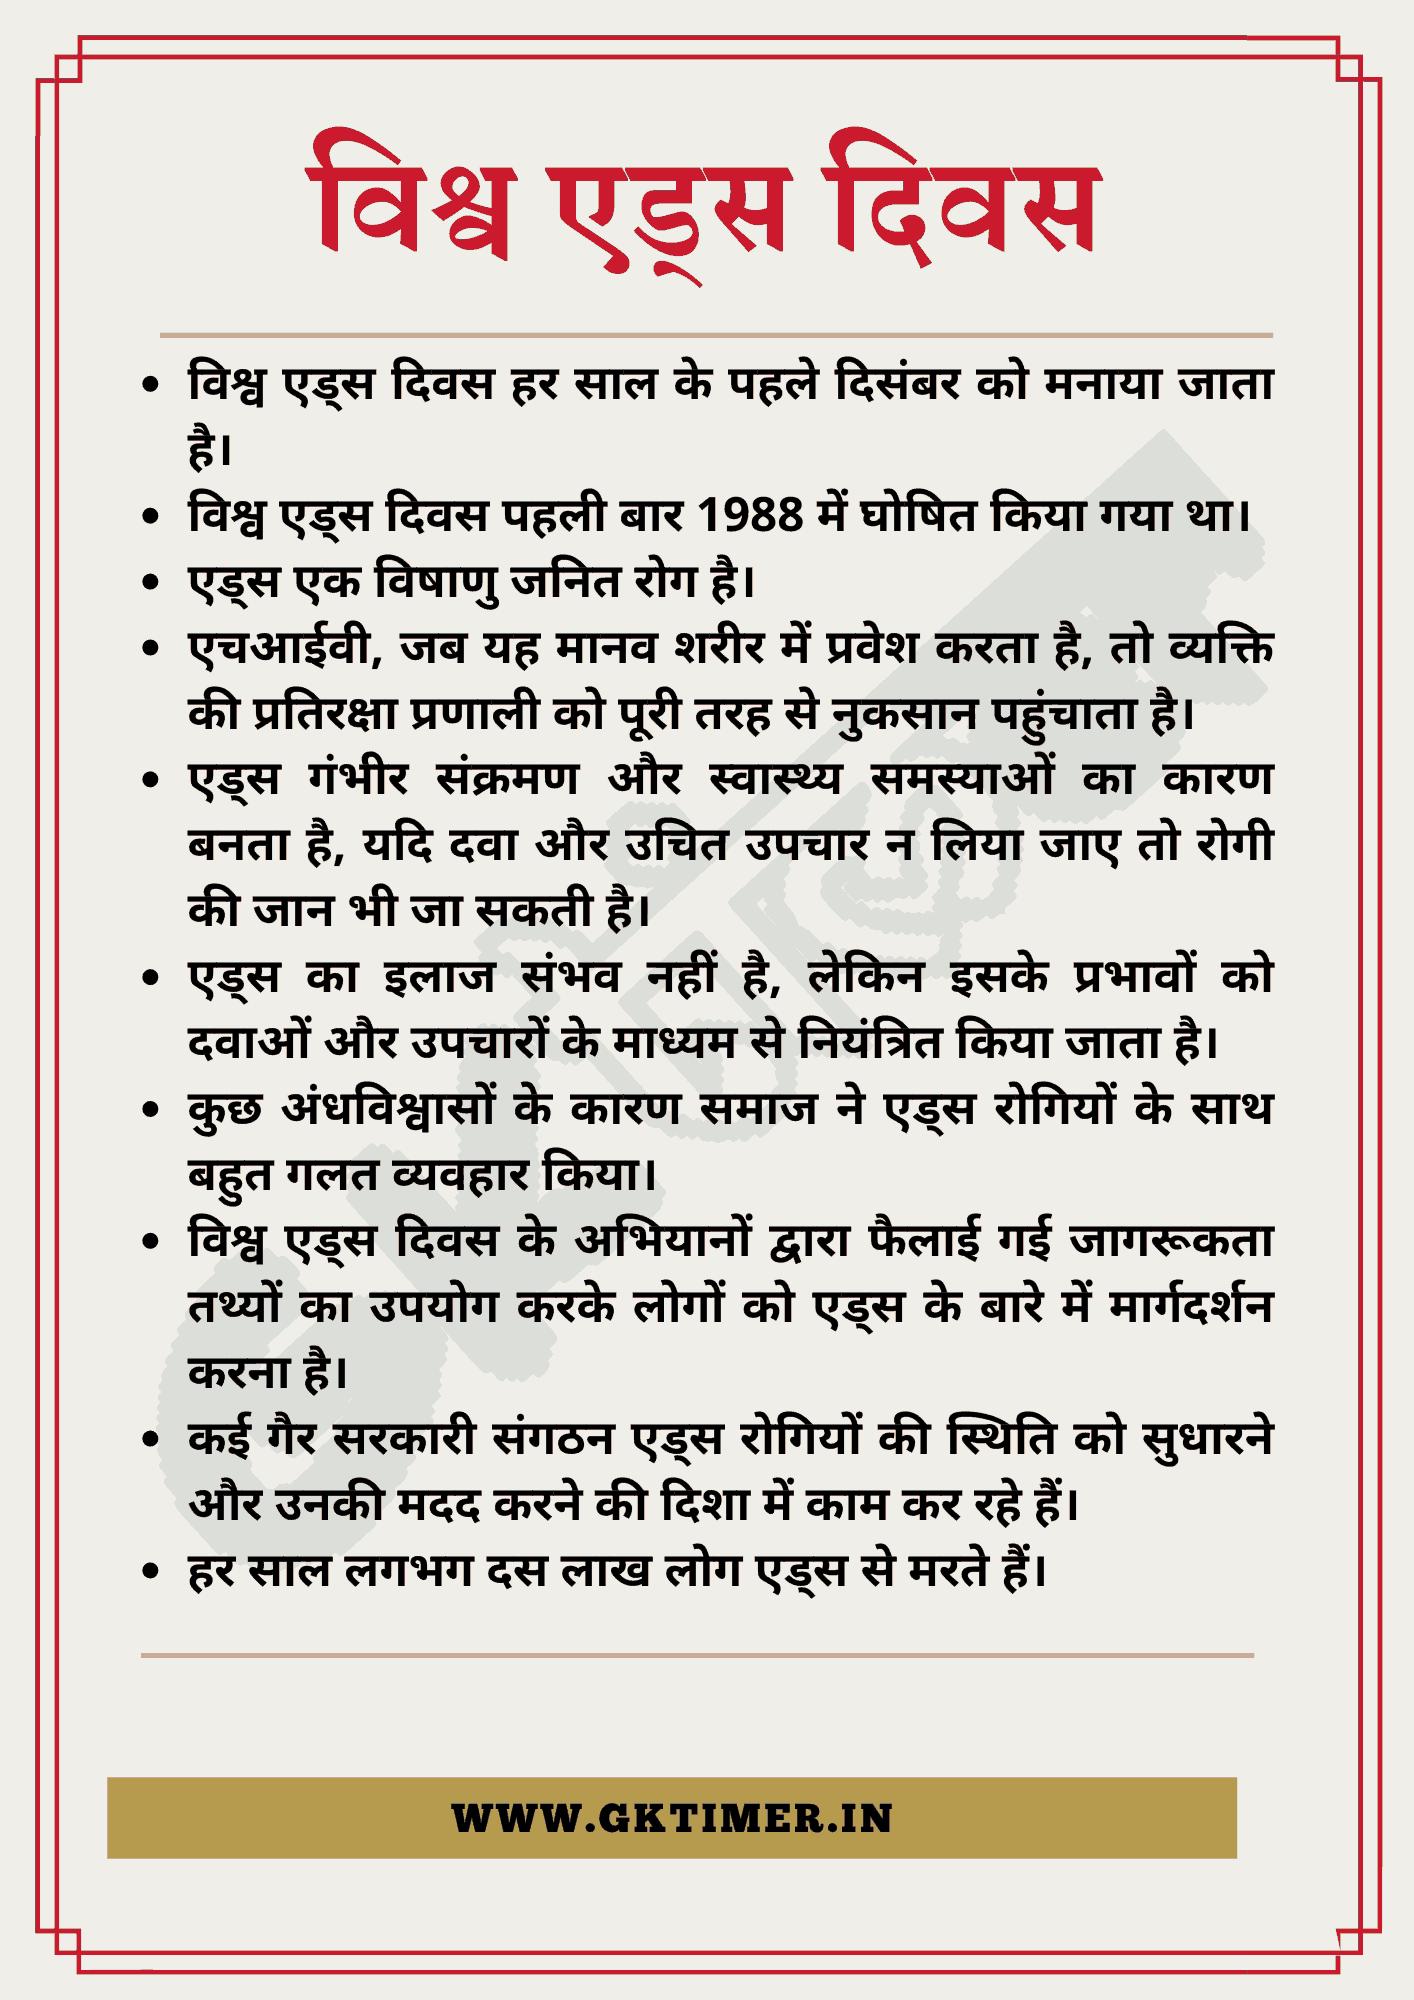 विश्व एड्स दिवस पर निबंध   World AIDS Day Essay in Hindi   10 Lines on World AIDS Day